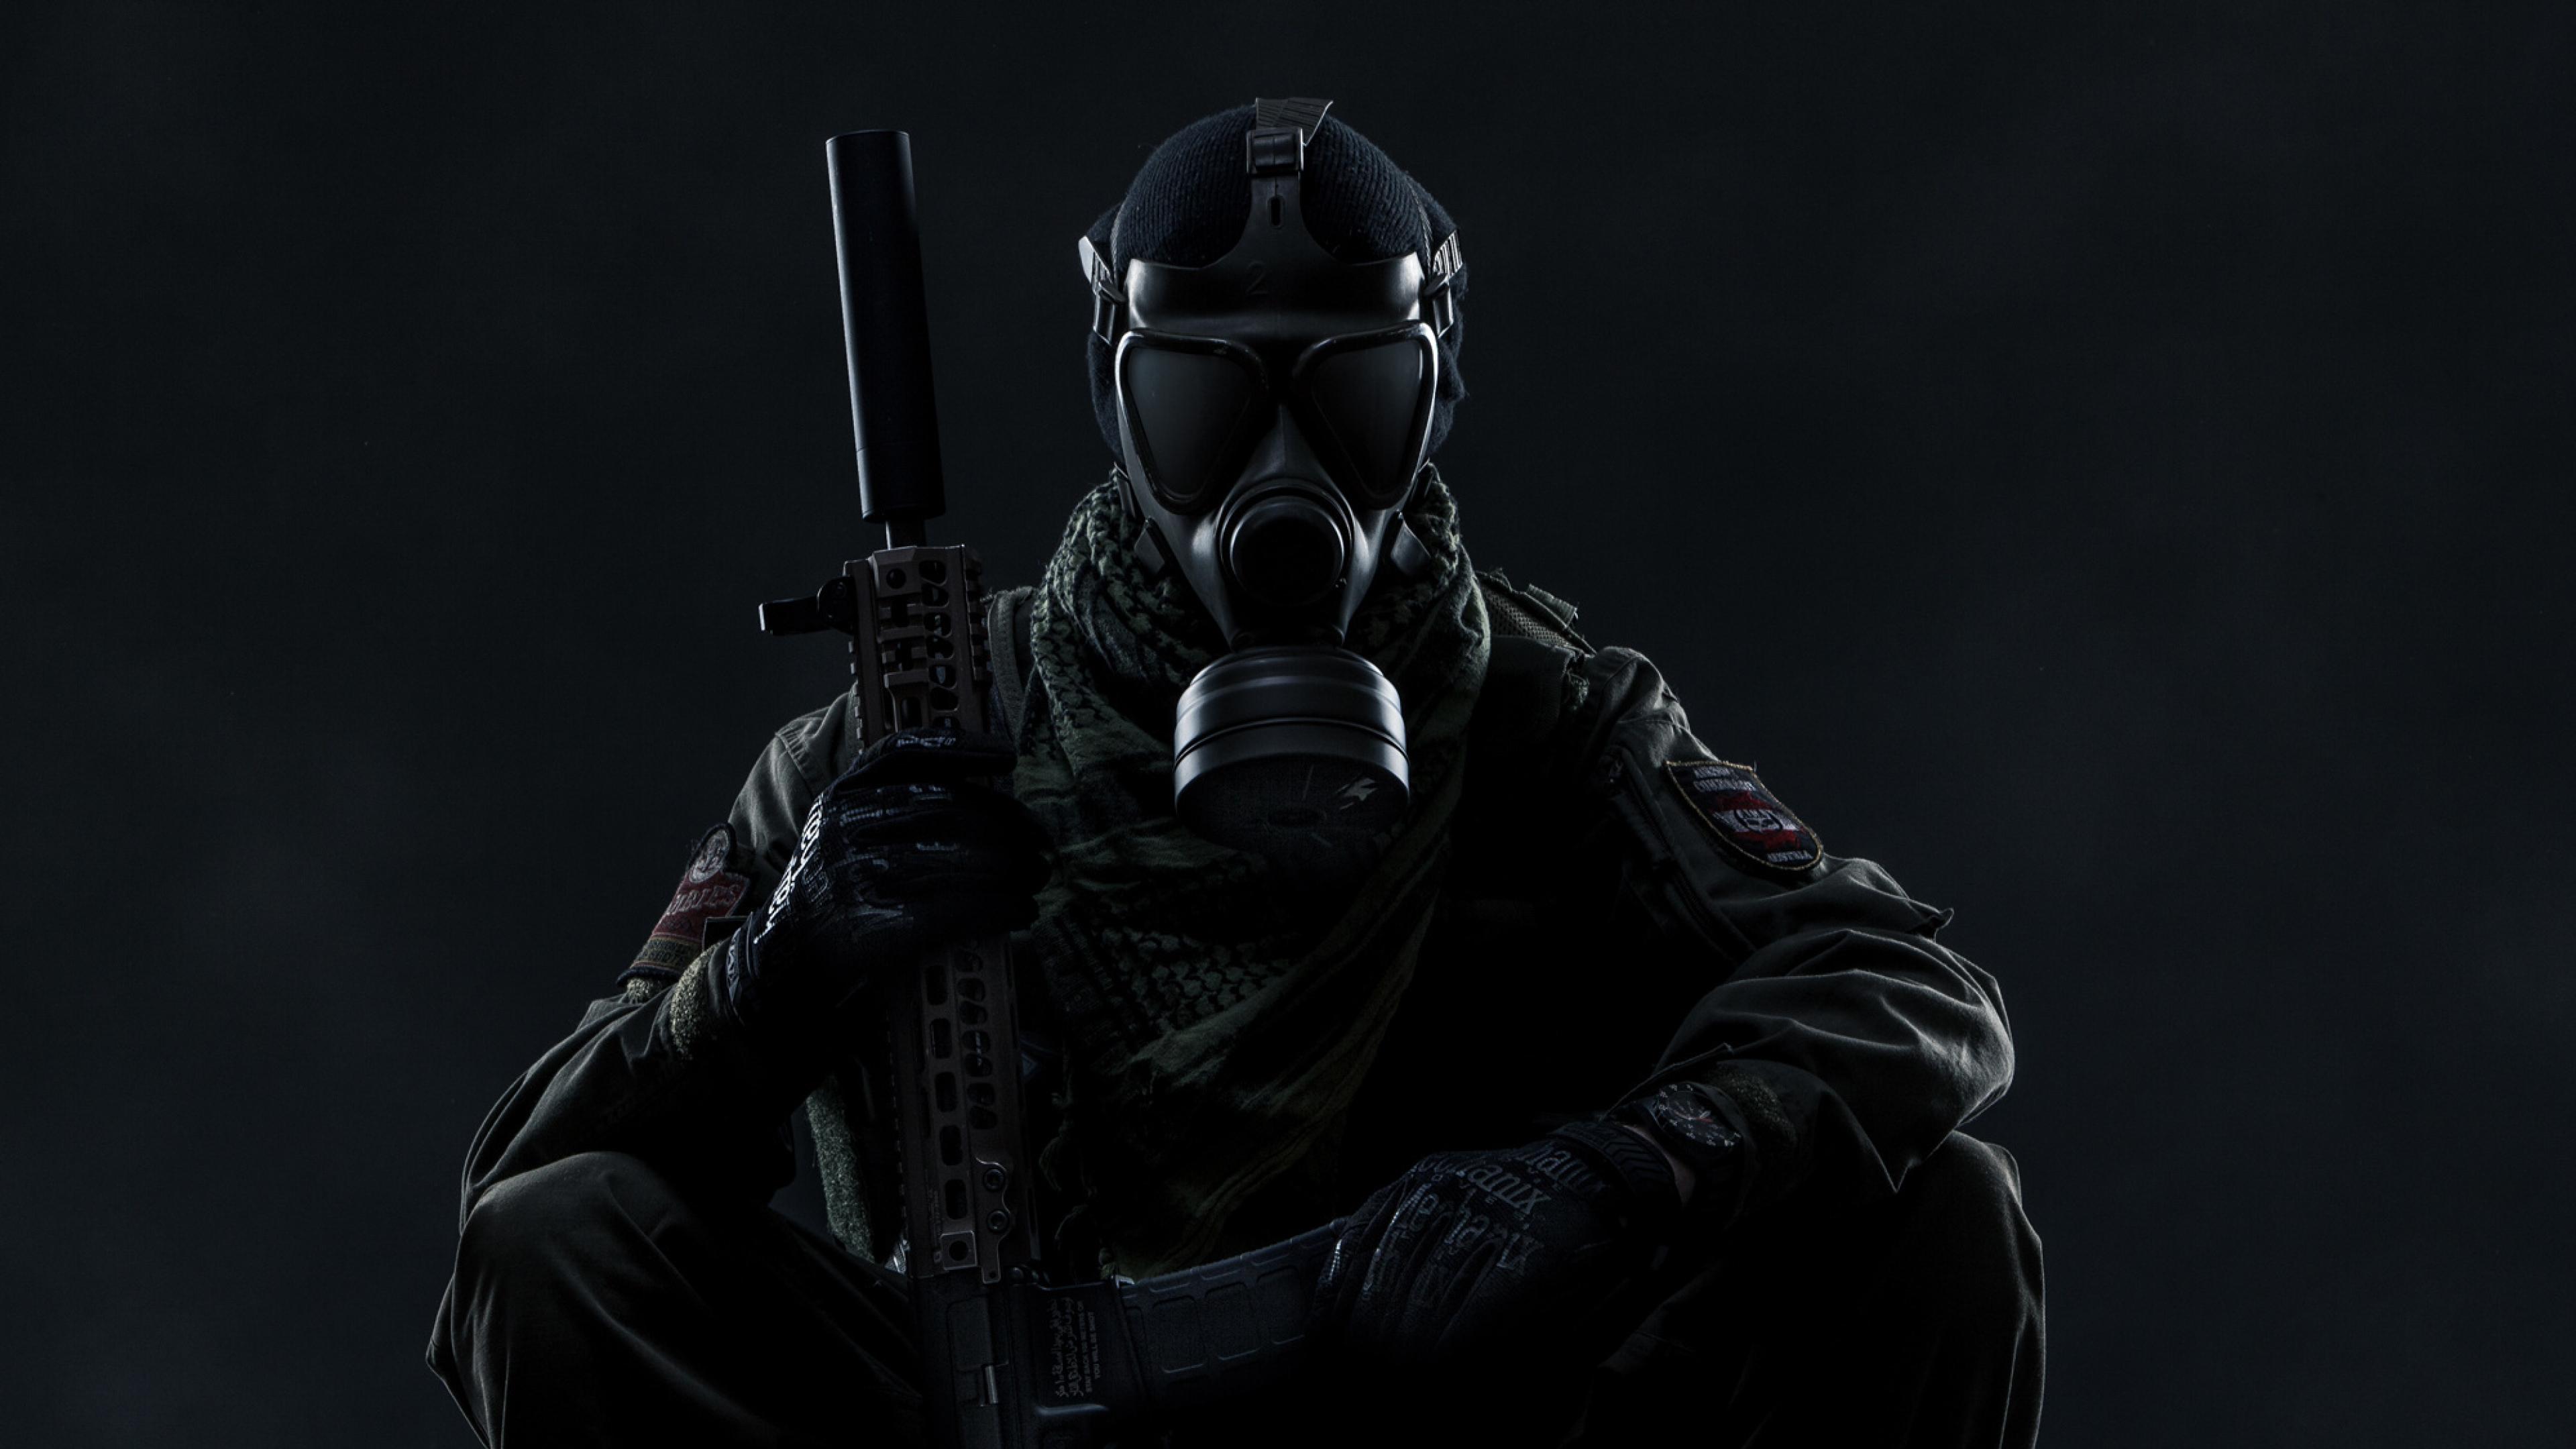 3840x2160 Gas Mask Soldier Tom Clancy S Ghost Recon Wildlands 4k